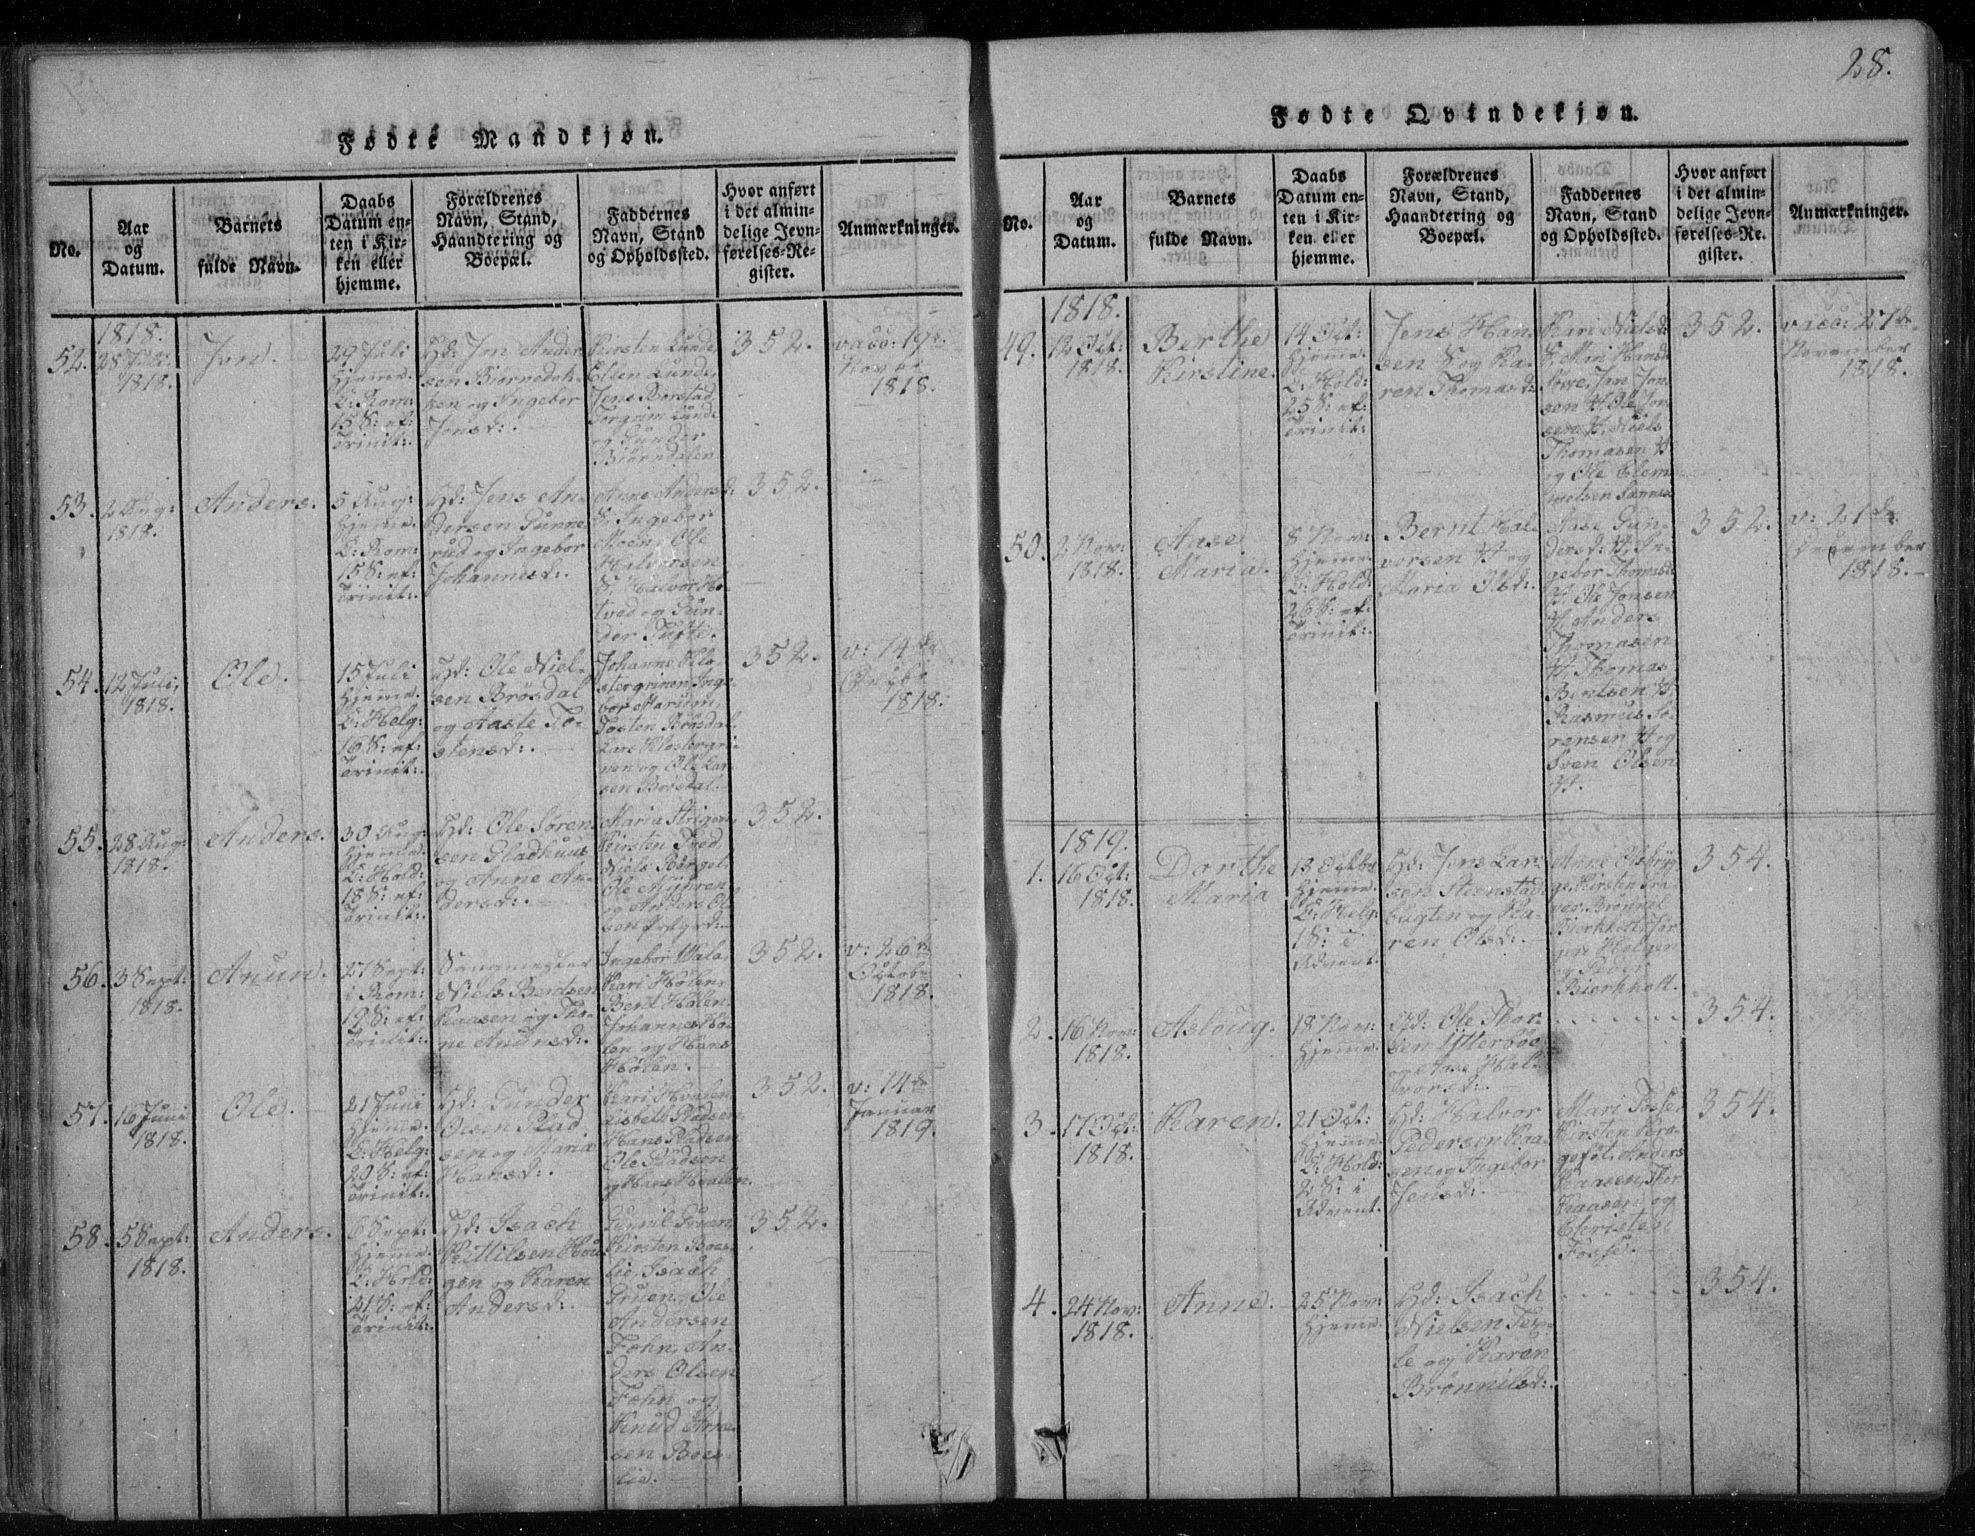 SAKO, Holla kirkebøker, F/Fa/L0003: Ministerialbok nr. 3, 1815-1830, s. 28